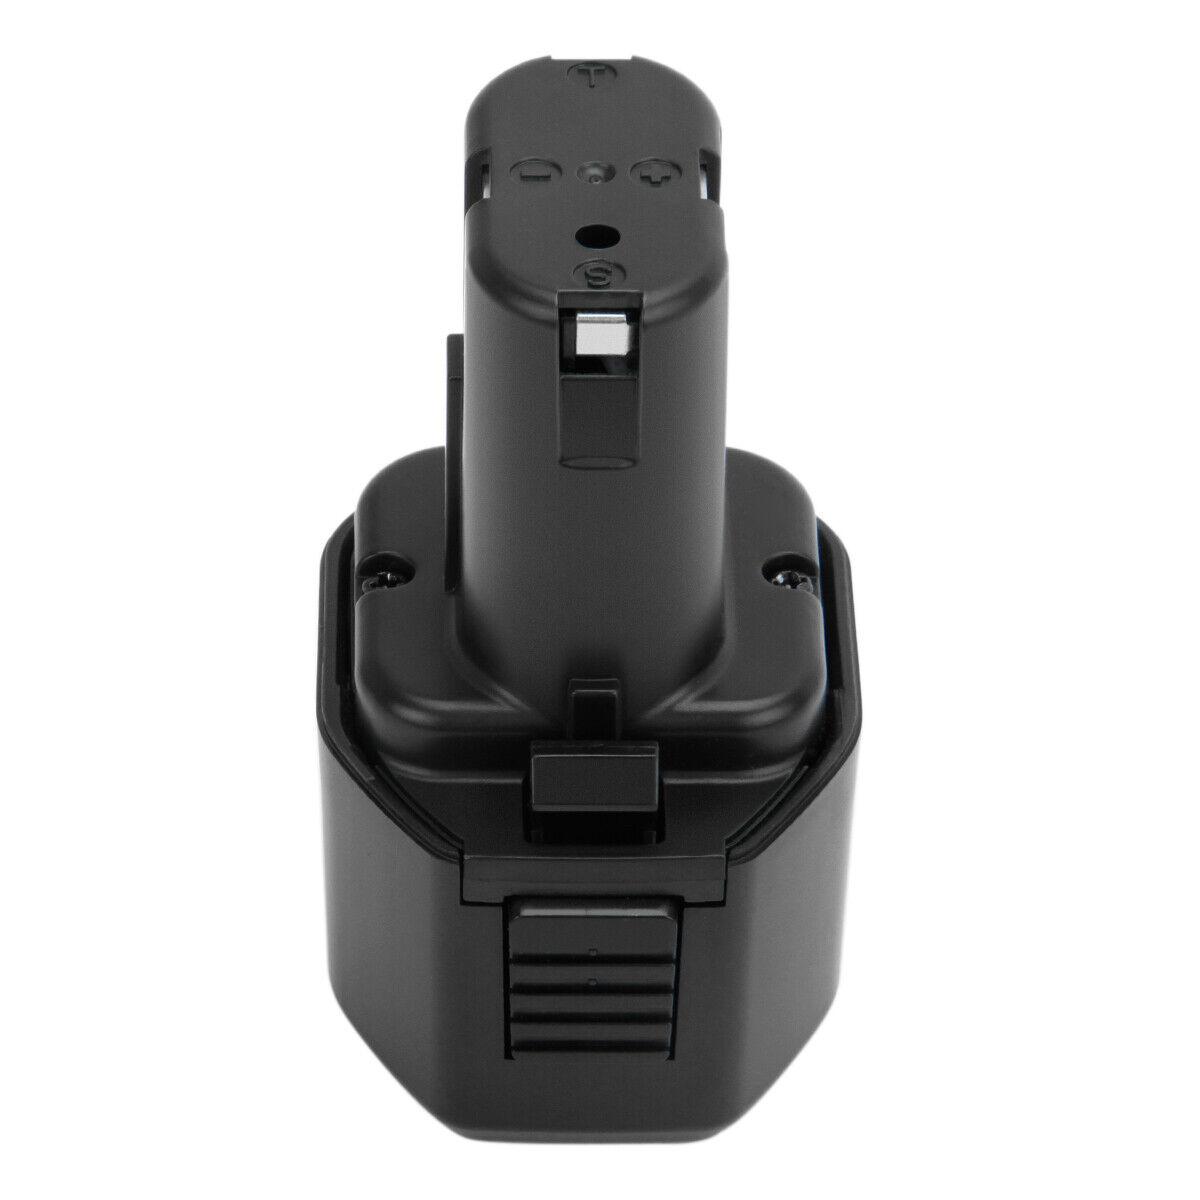 2Pcs 3.0AH 7.2V Ni-MH Nail Gun Battery for Hitachi EB7 EB7B EB7G EB7M EB7S FEB7S